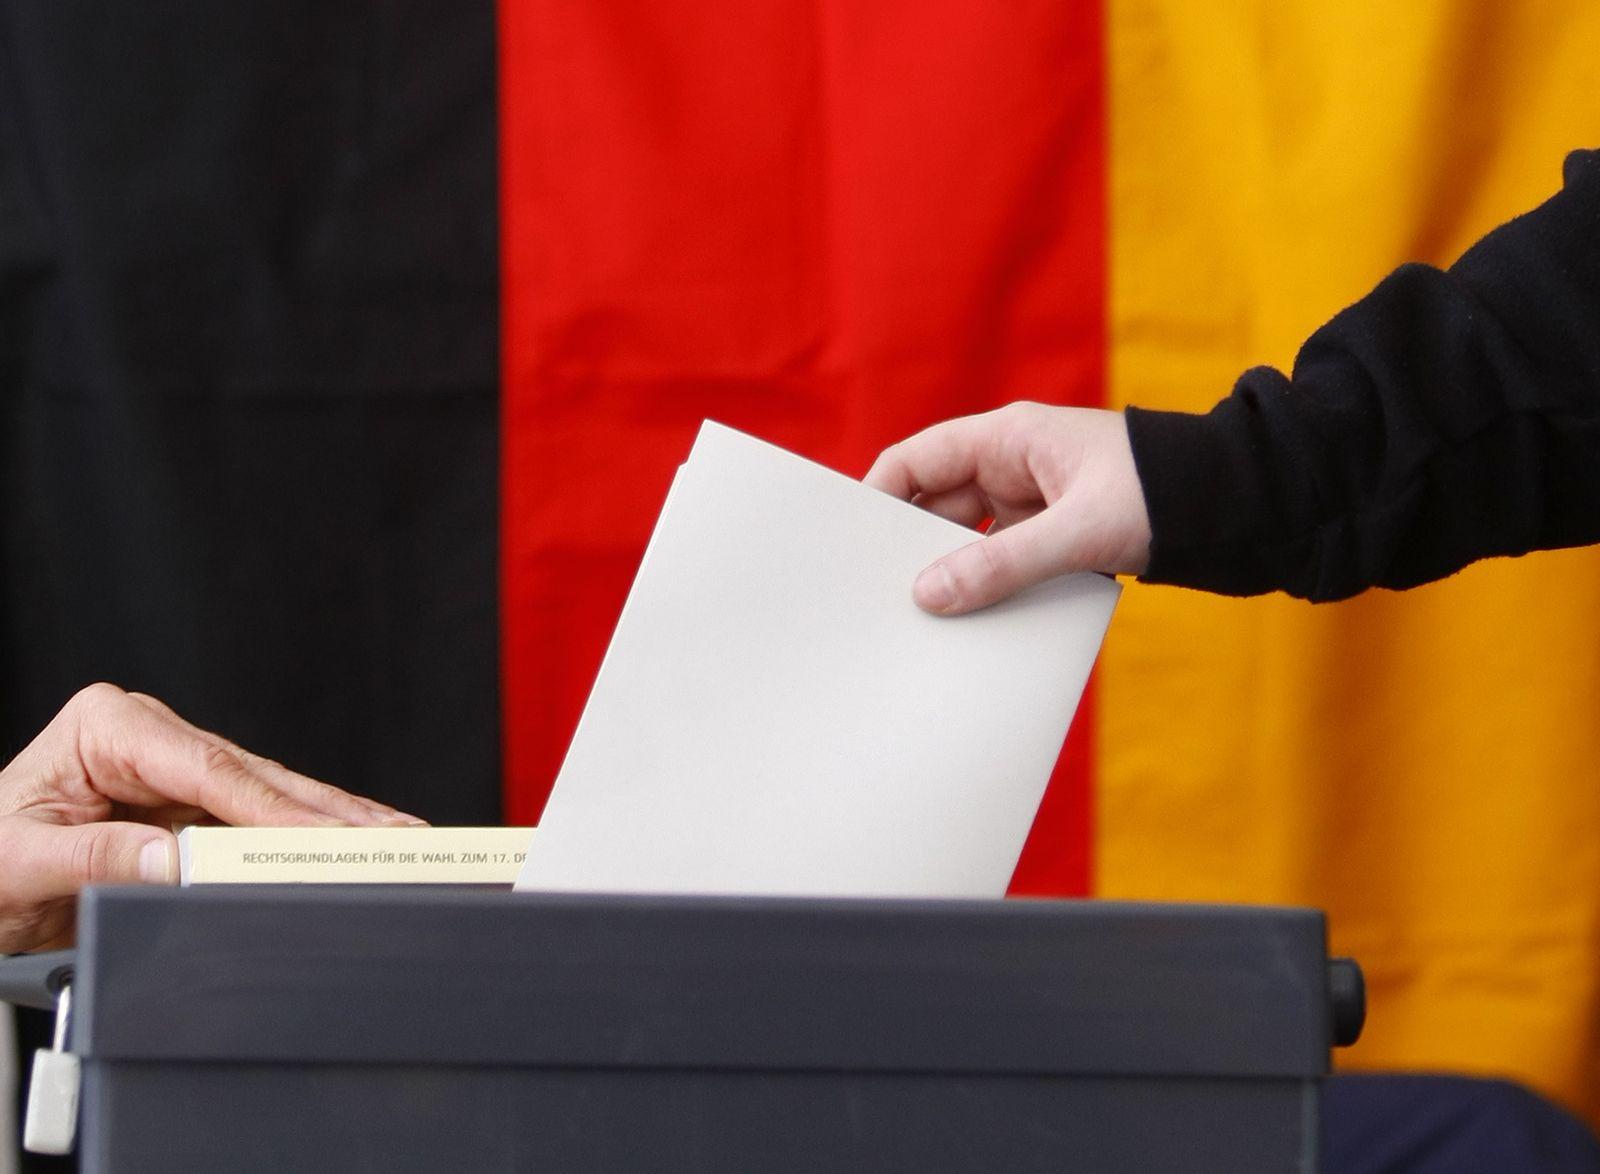 Wahlen/ Wahlurne